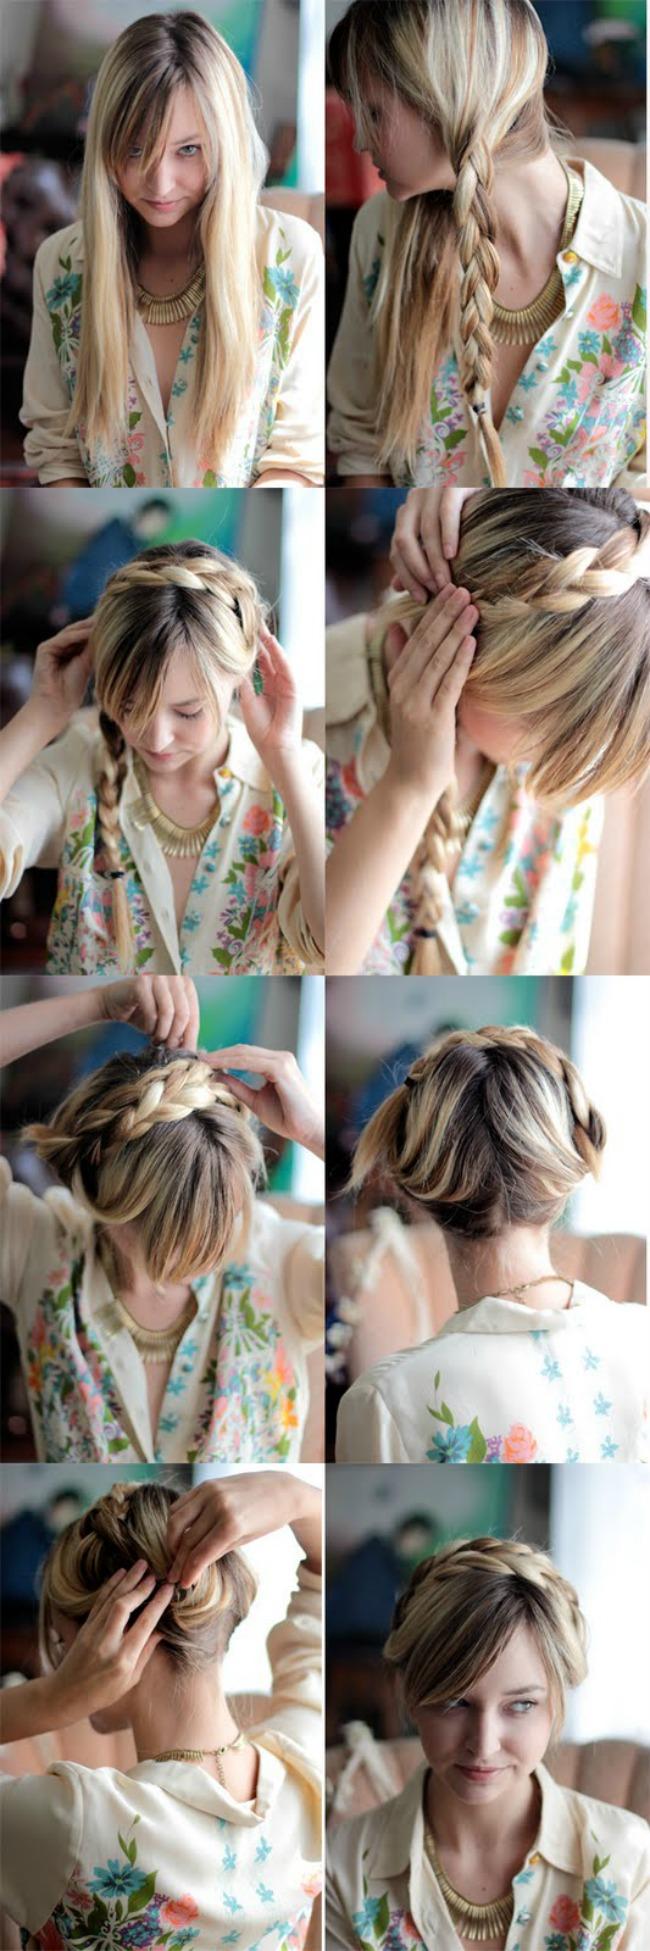 Ruska pletenica Laka frizura za kume: Ukrajinska pletenica